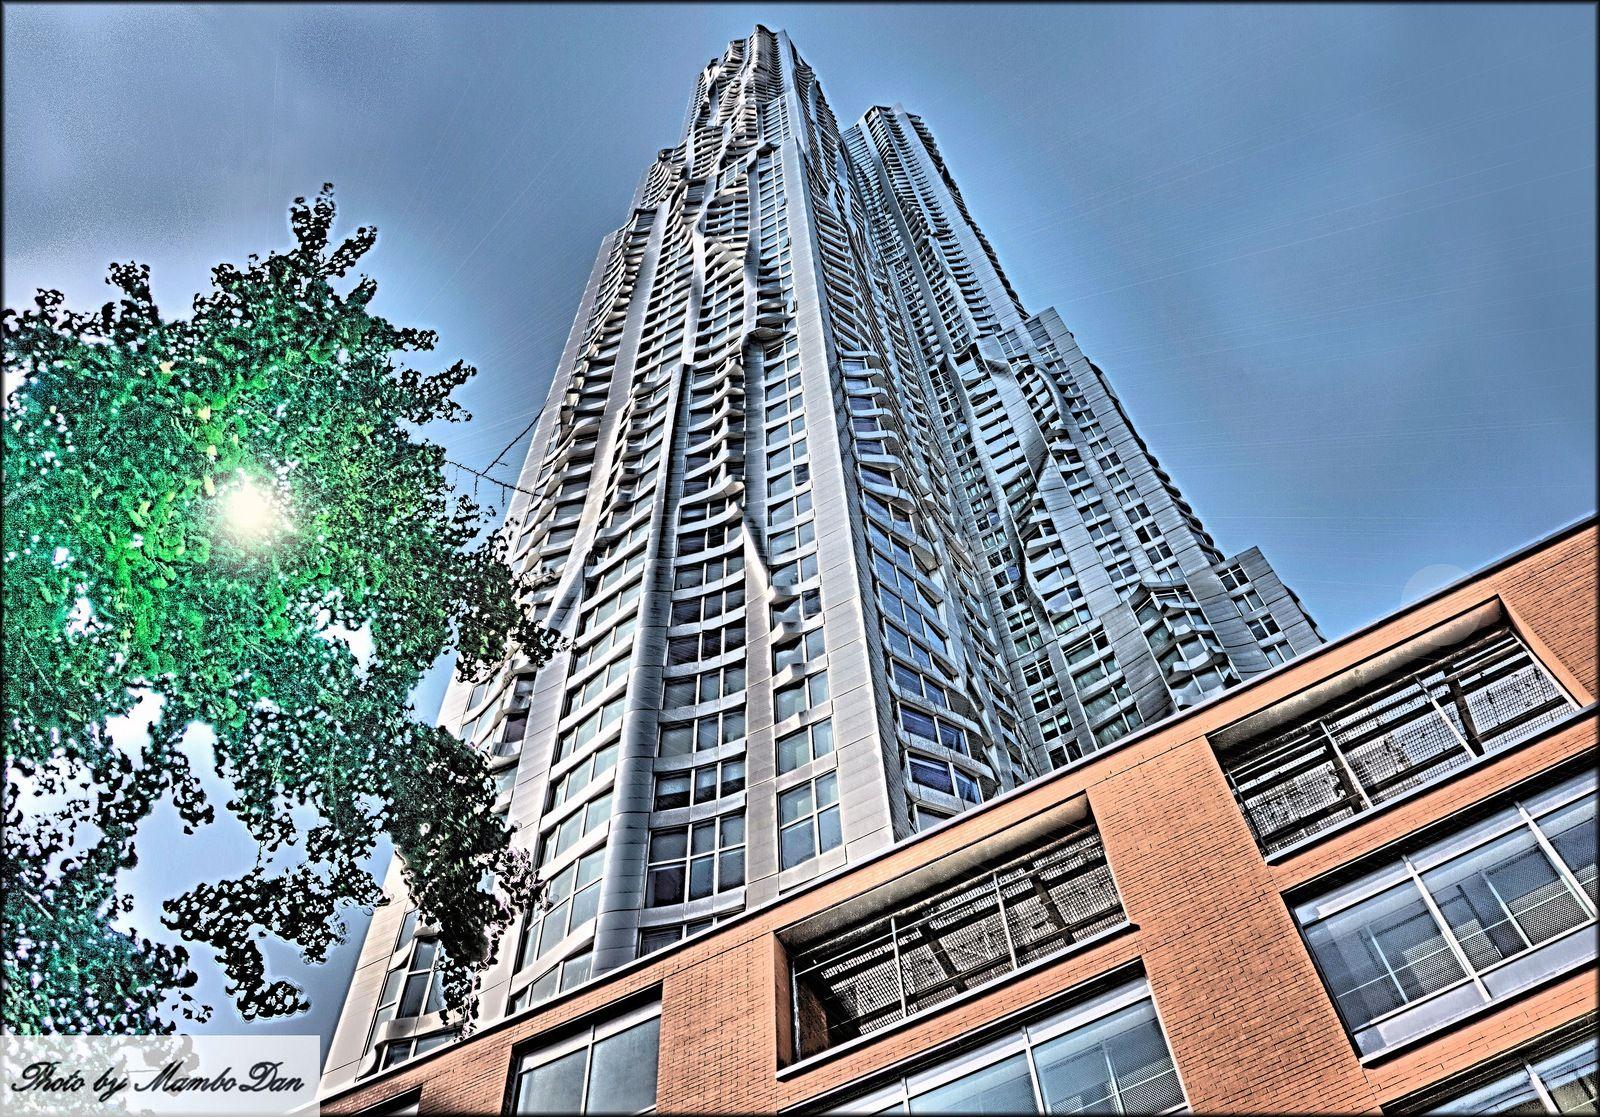 Frank Gehry tower wins global skyscraper award